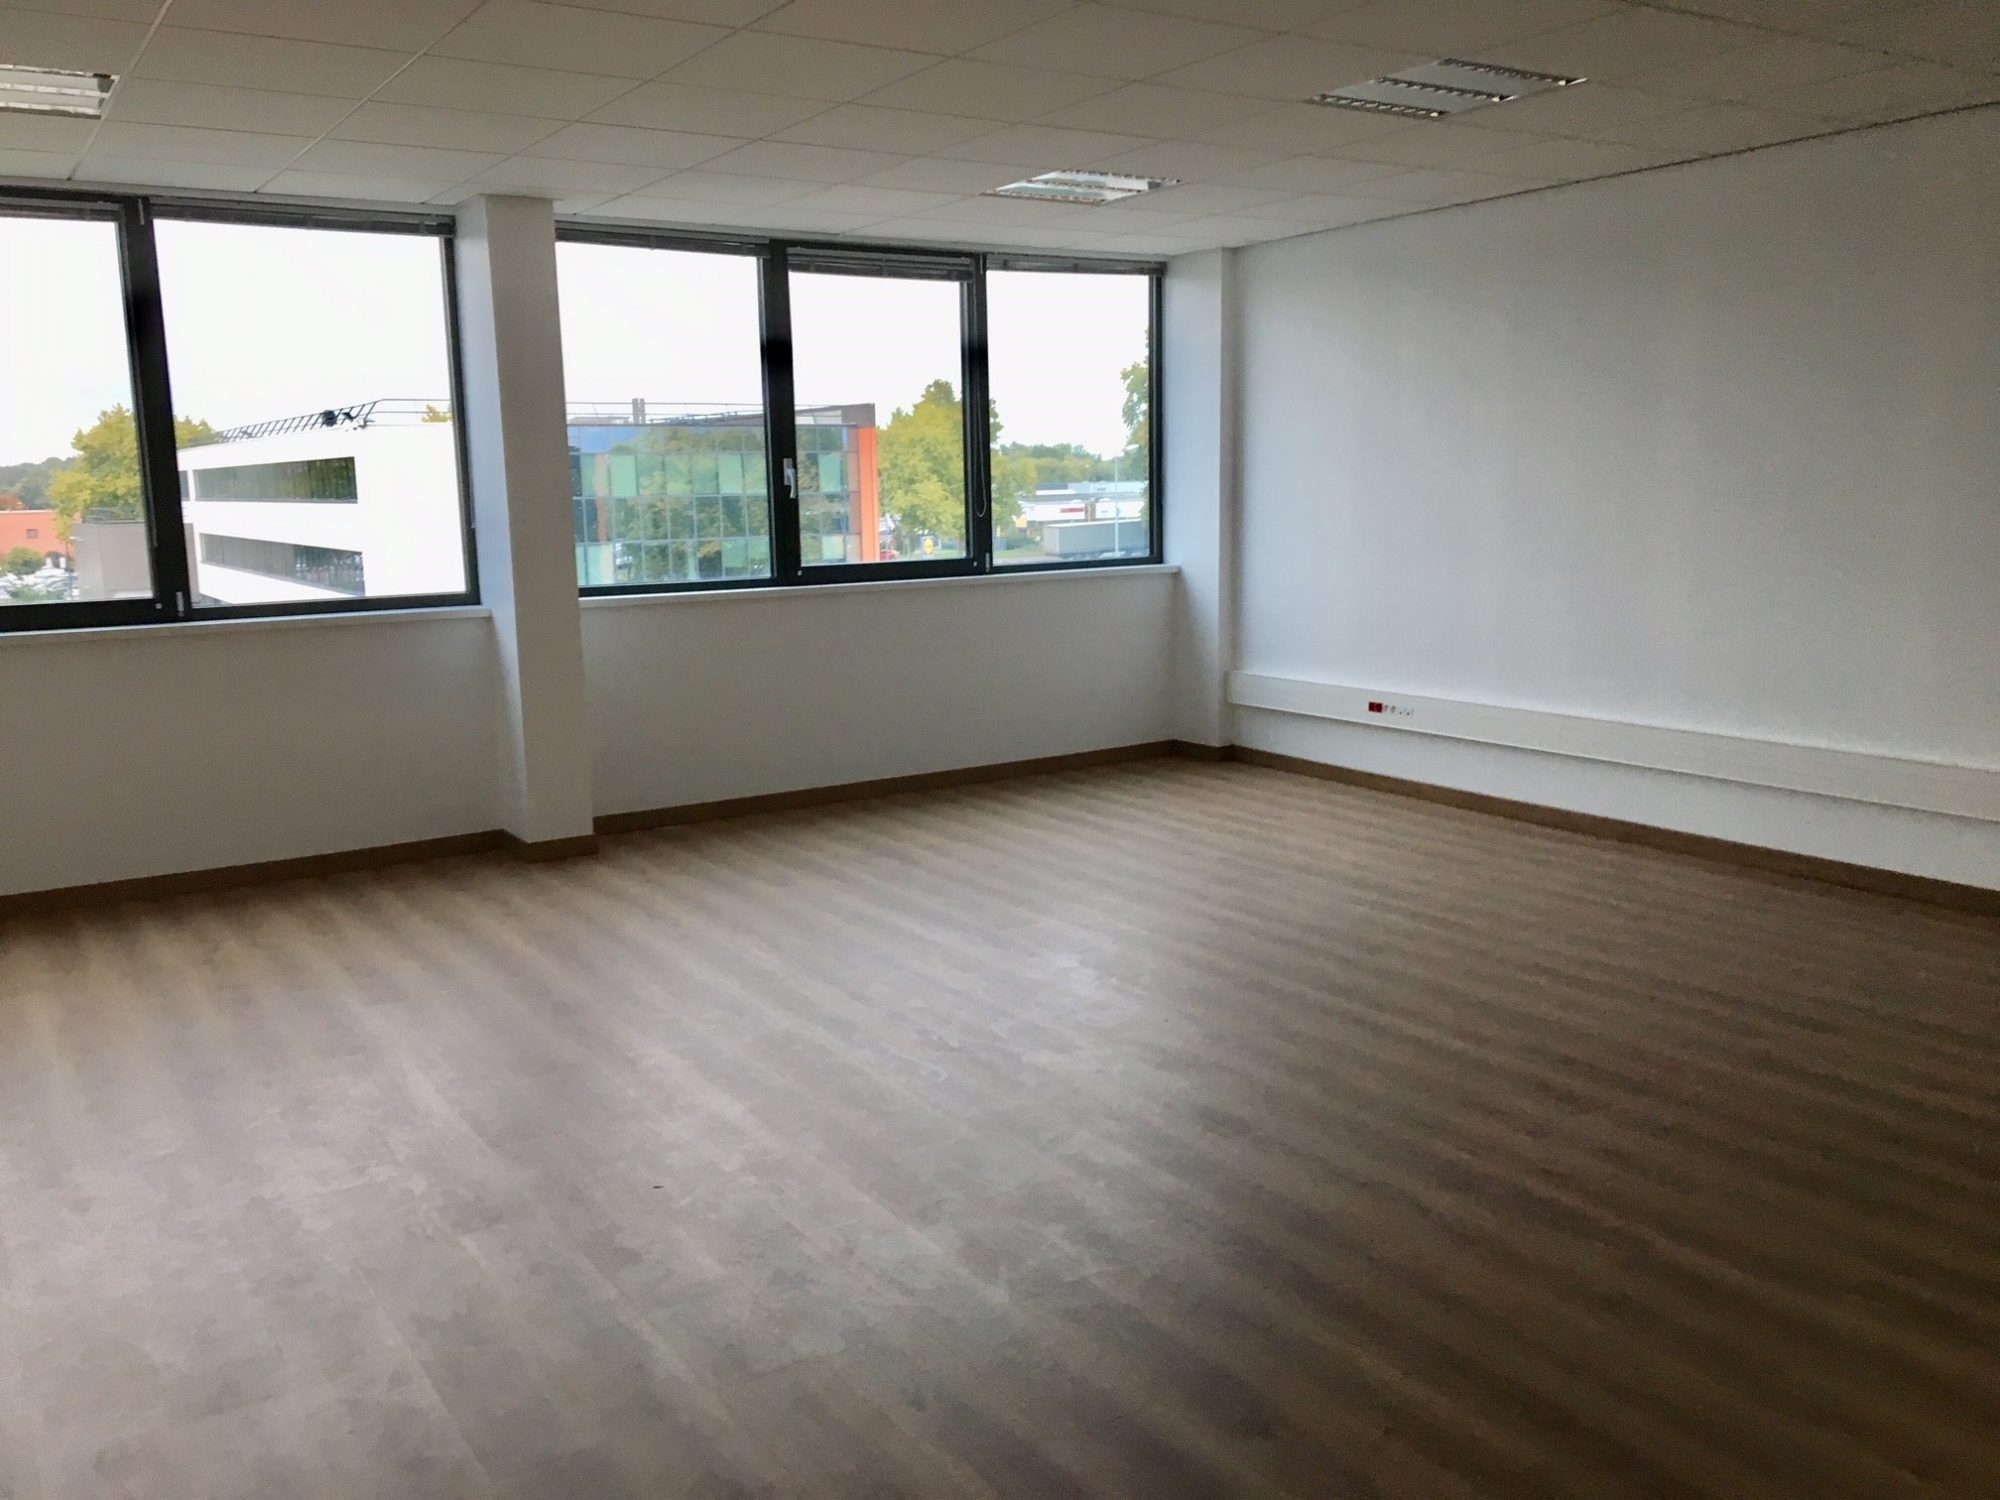 Bureaux 50 m² renovés dans le ZA de Bischheim/Hoenheim